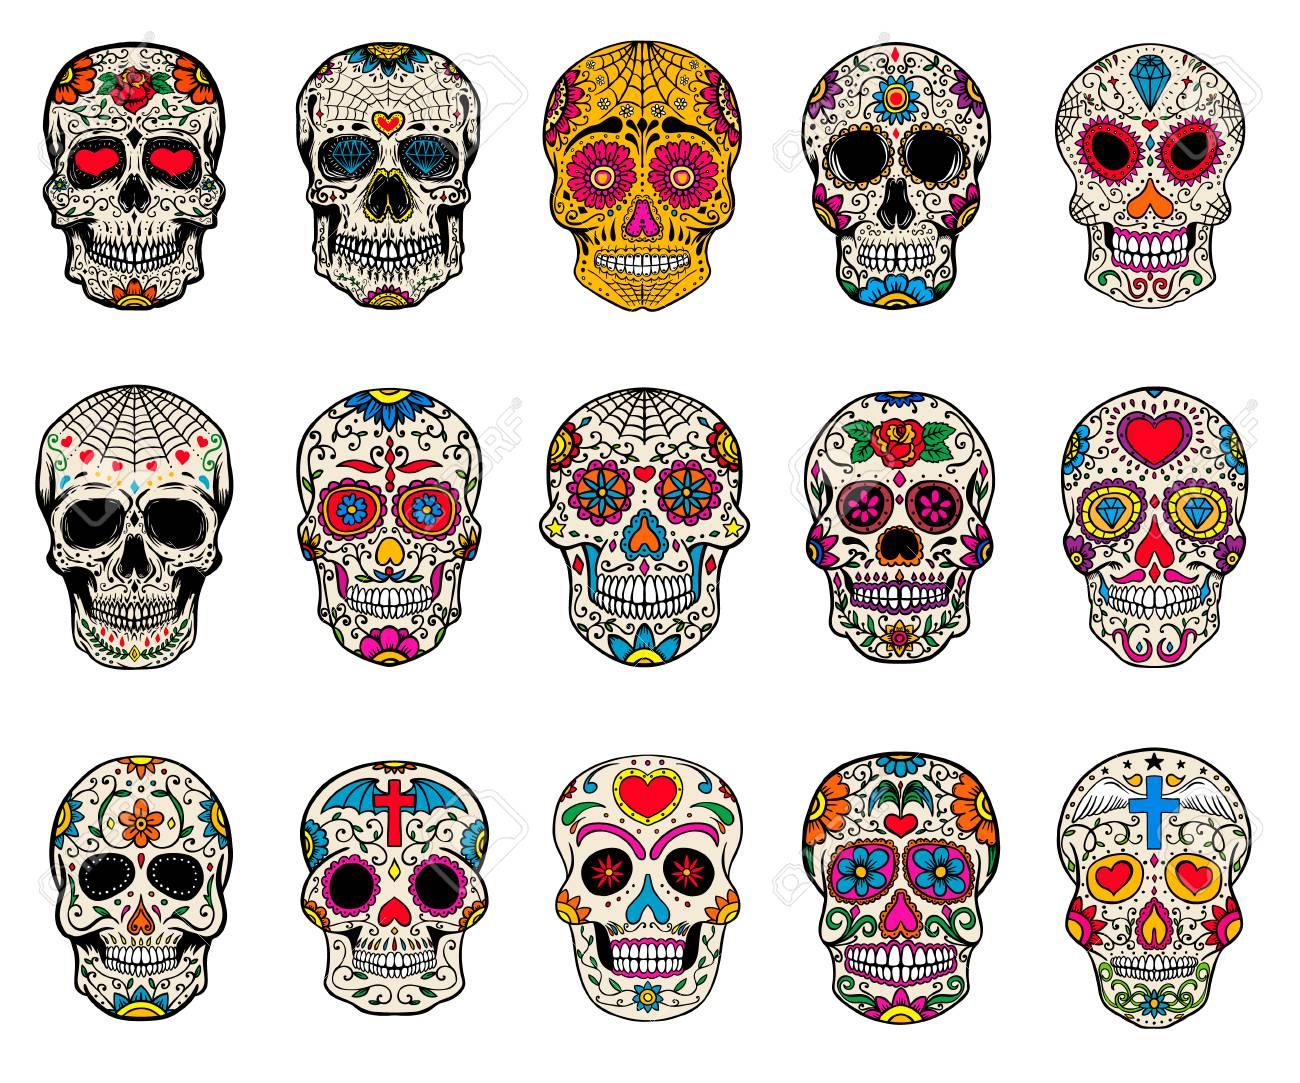 Set of sugar skulls illustrations. Dead day. Dia de los muertos. Design elements for poster, card, flyer, banner. Vector illustration. - 87971493